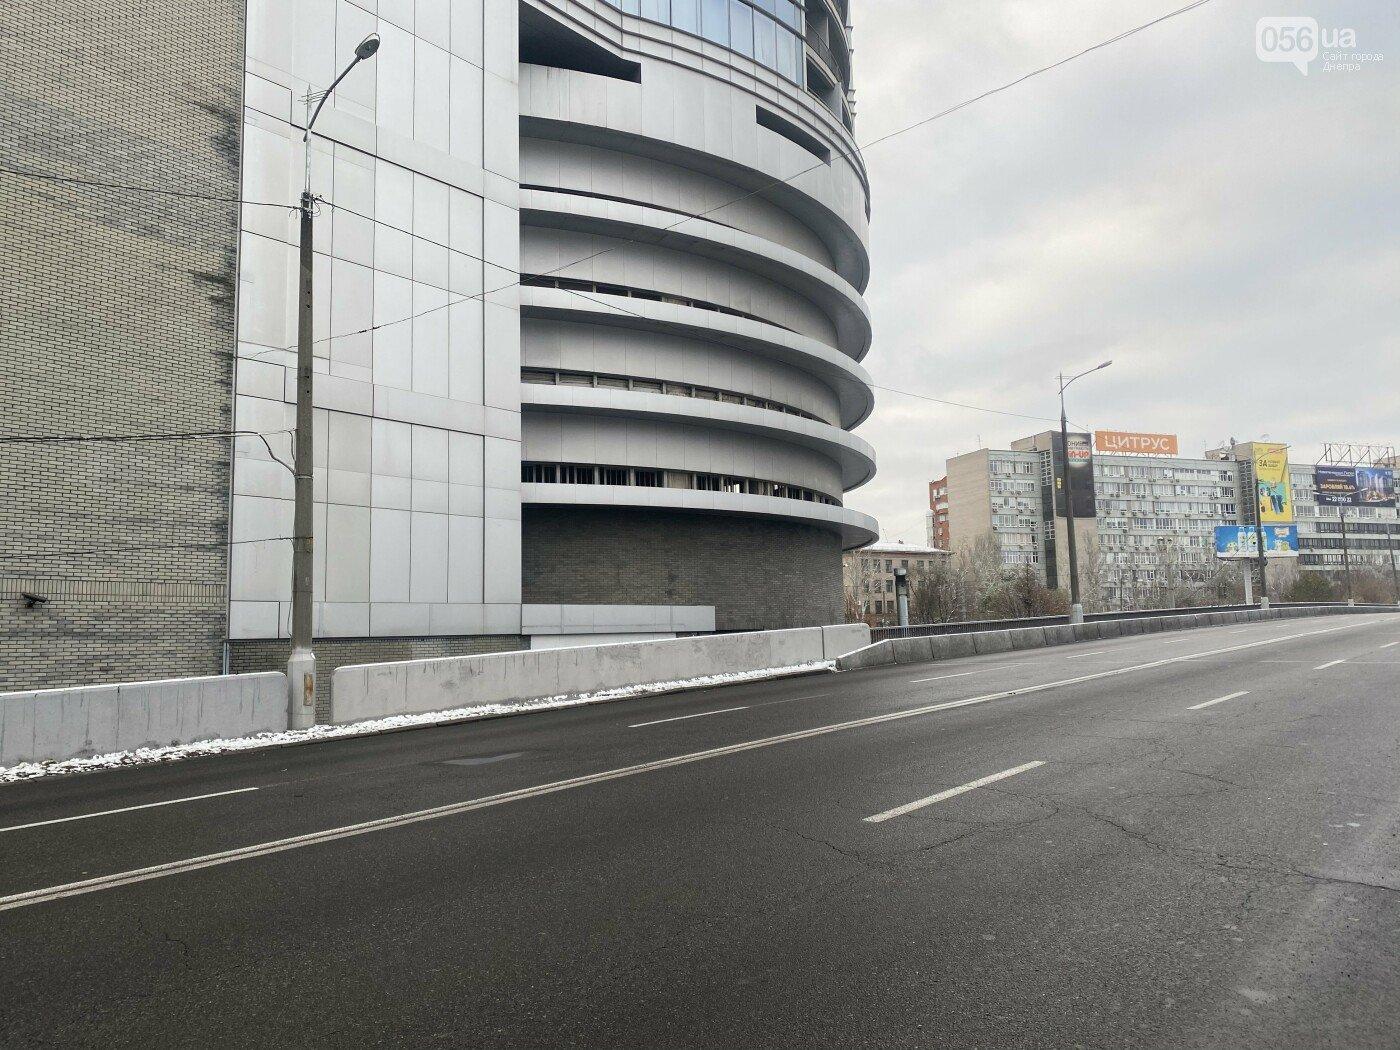 Съезд с Центрального моста на ул. Коцюбинского, 2020 год